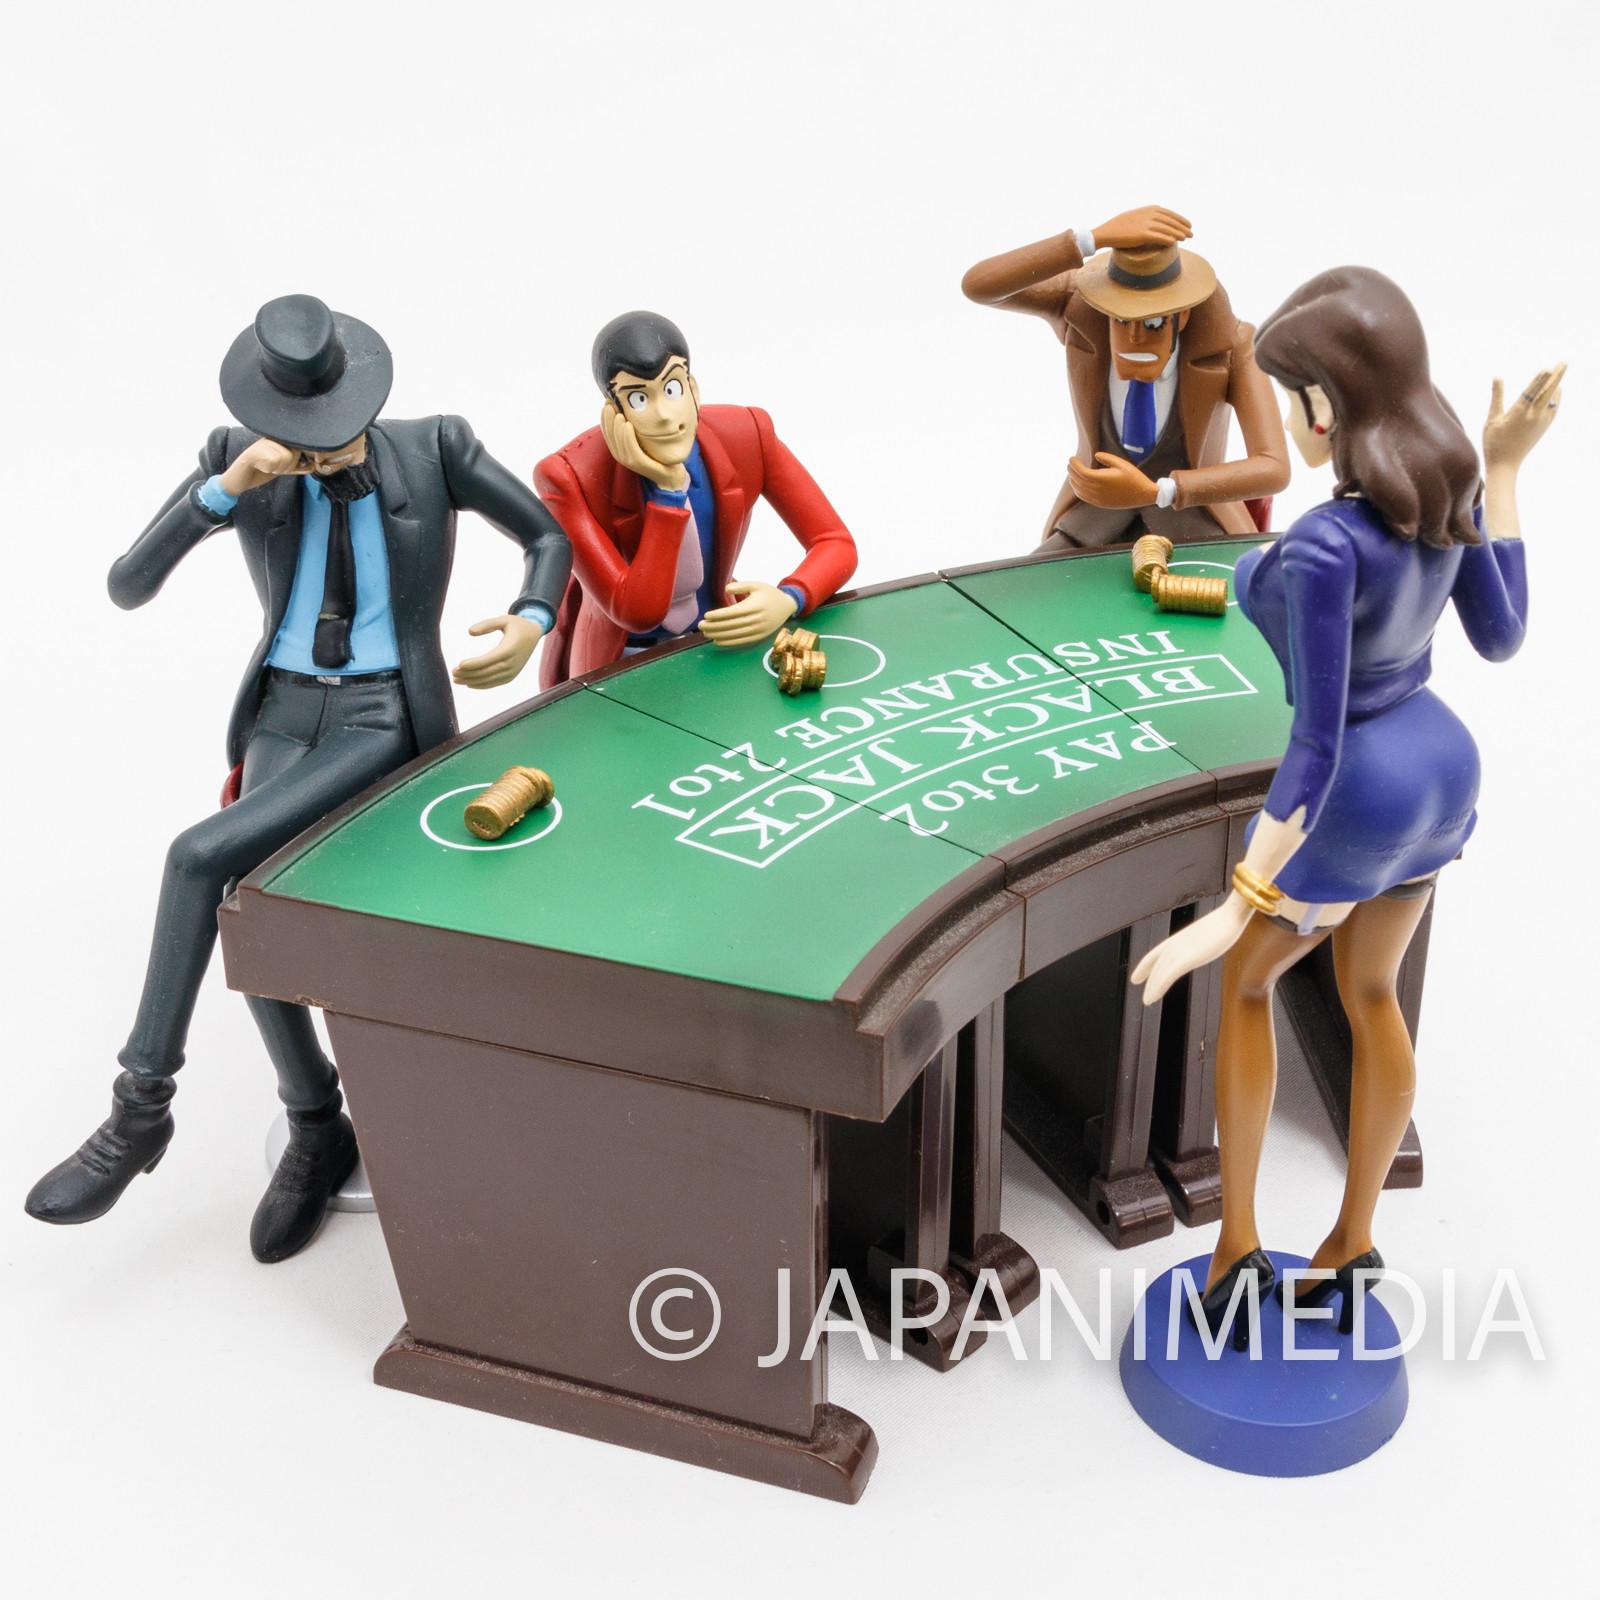 (Parts Missing) Lupin the Third (3rd) Casino Scene Figure Set Banpresto JAPAN ANIME MANGA